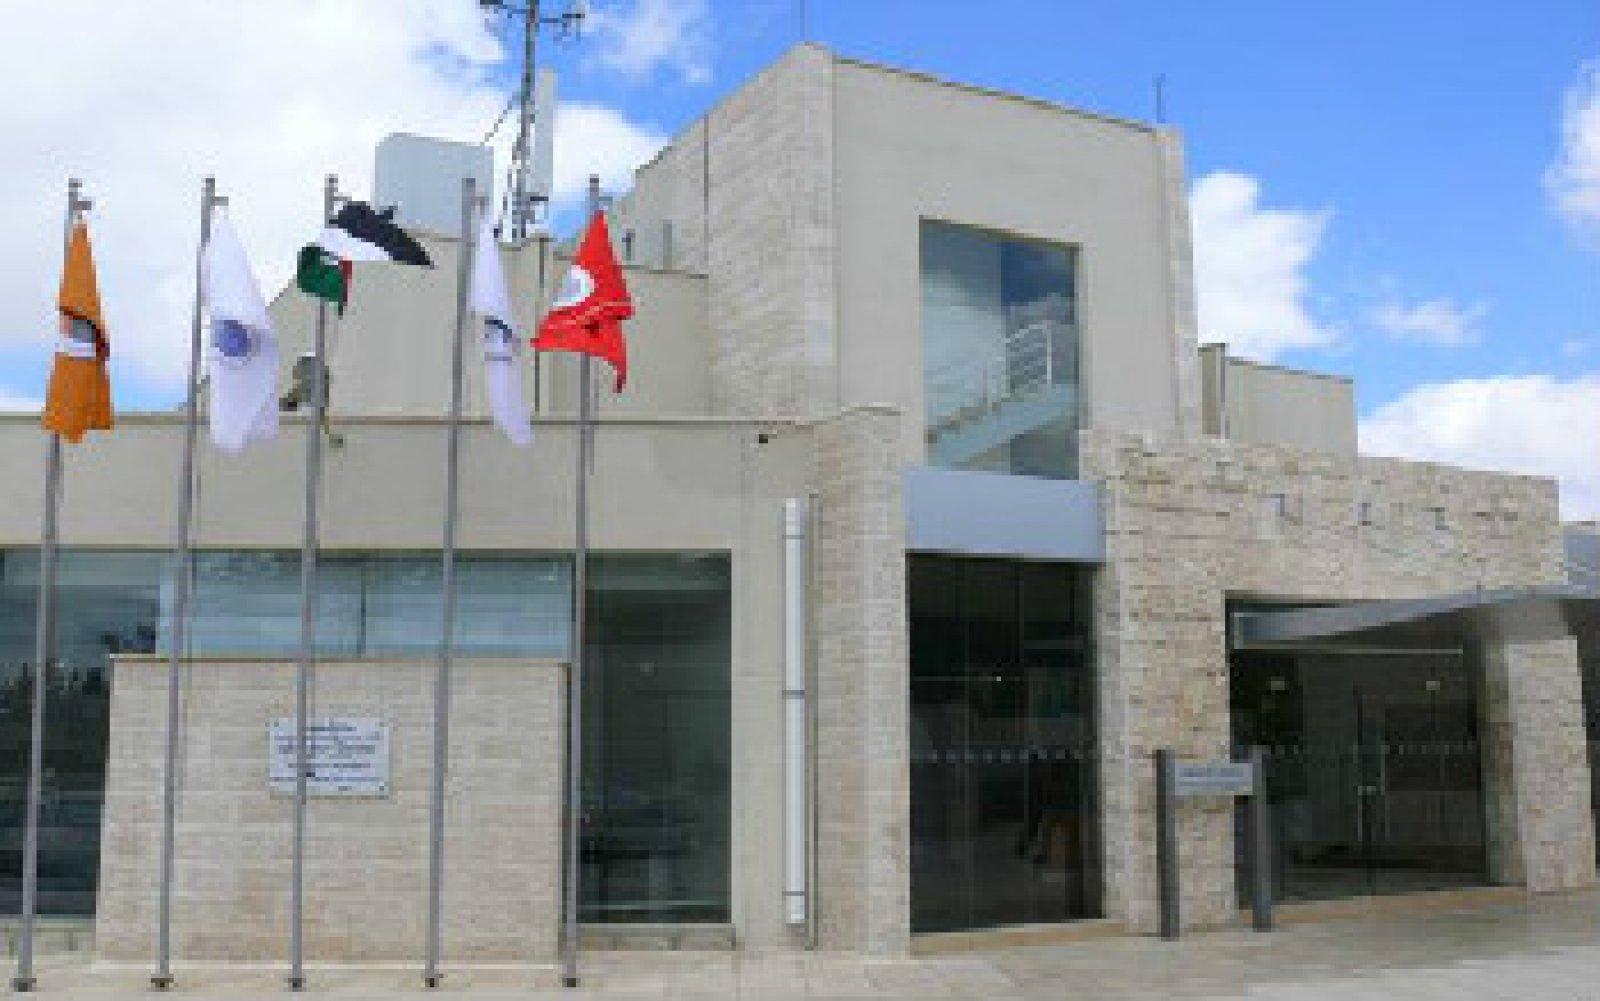 Princess Sumaya Üniversitesi, Ürdün